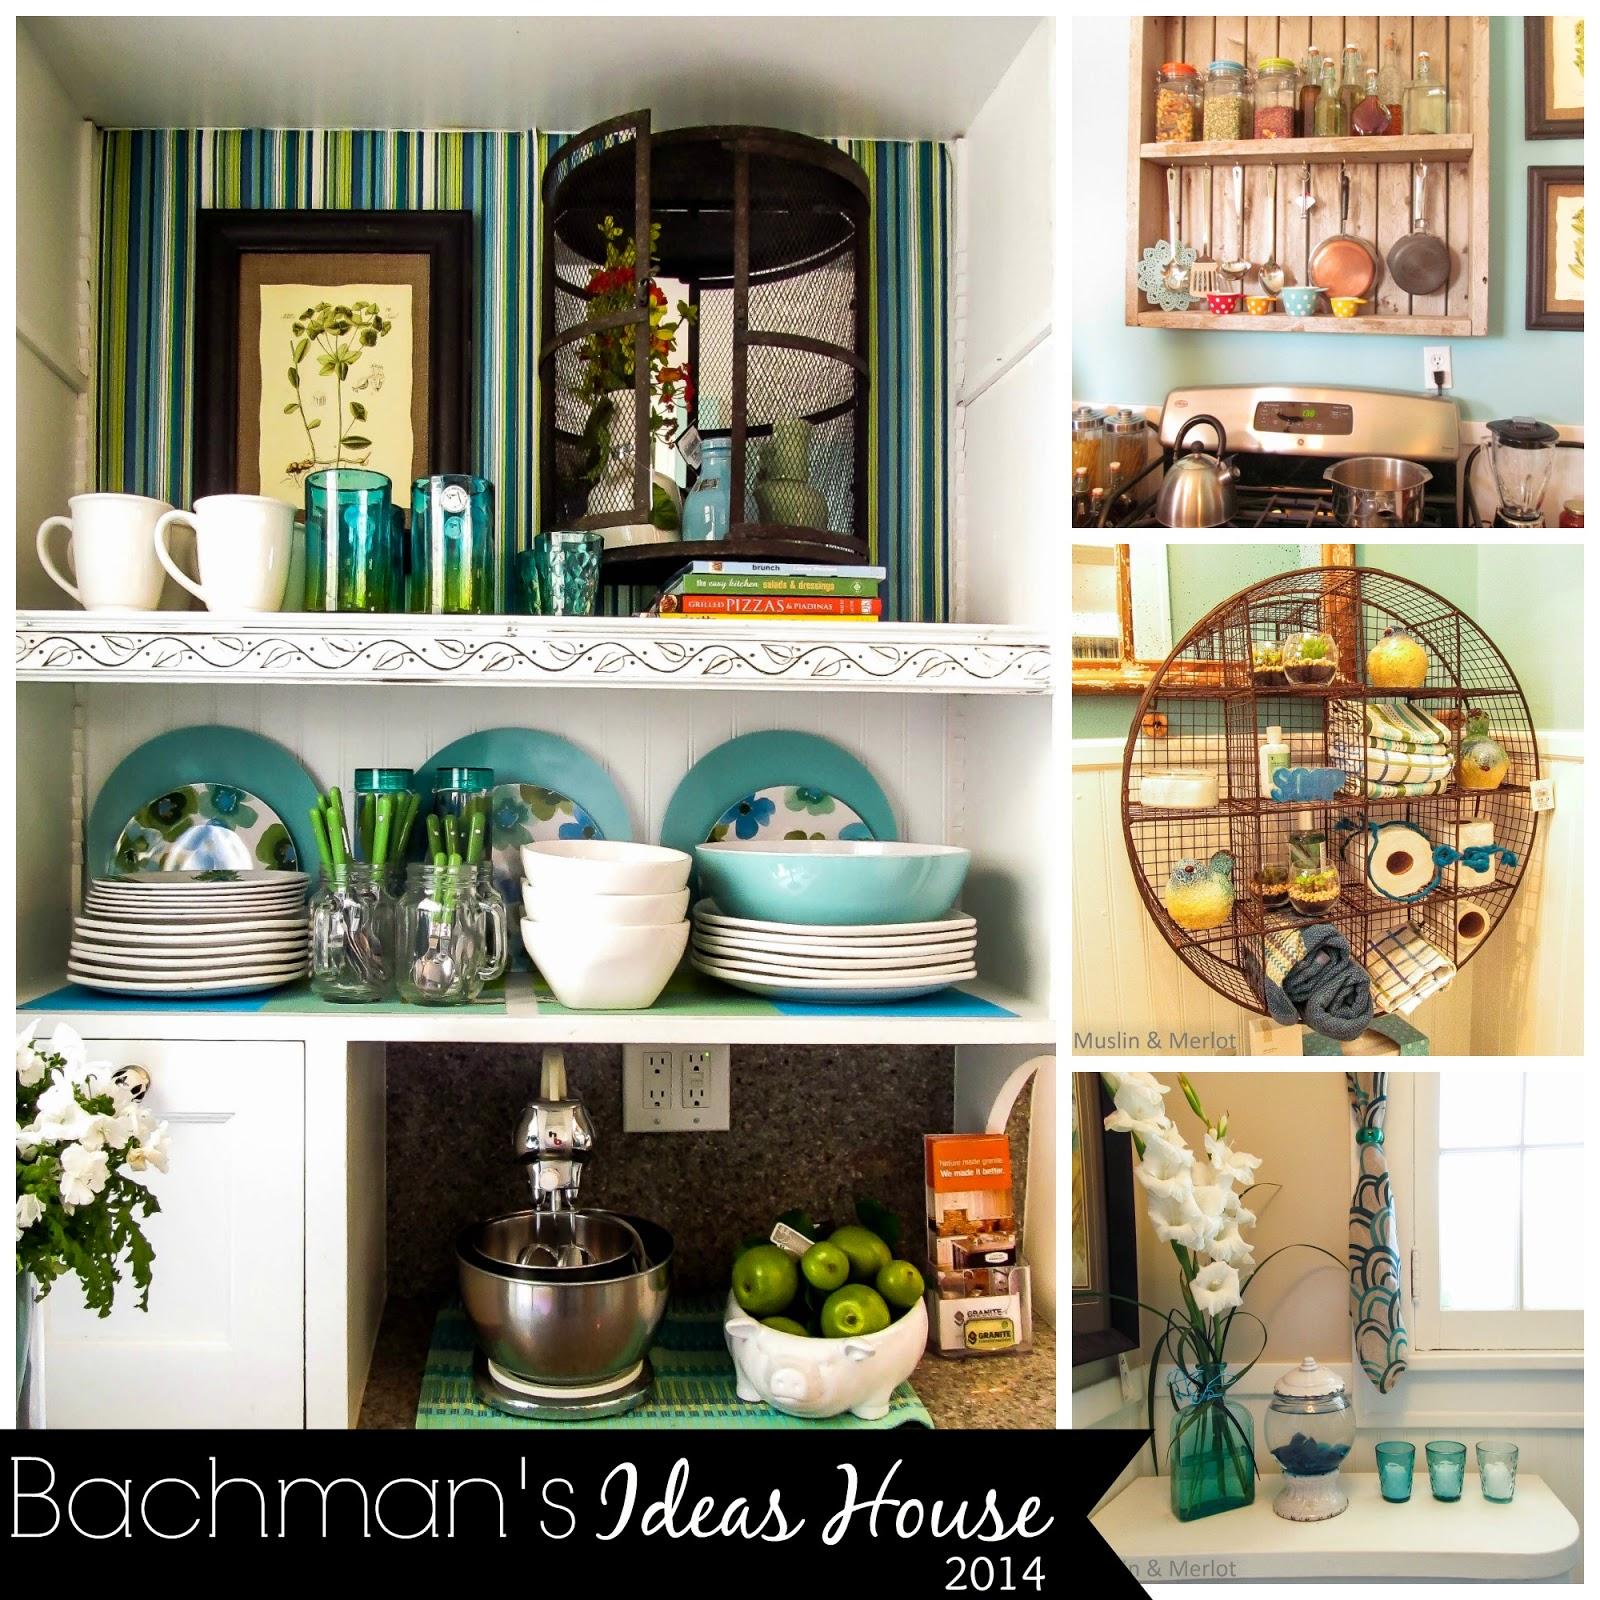 Kitchen And Bath Ideas: Bachman's Spring Ideas House 2014 {Kitchen & Bath Ideas